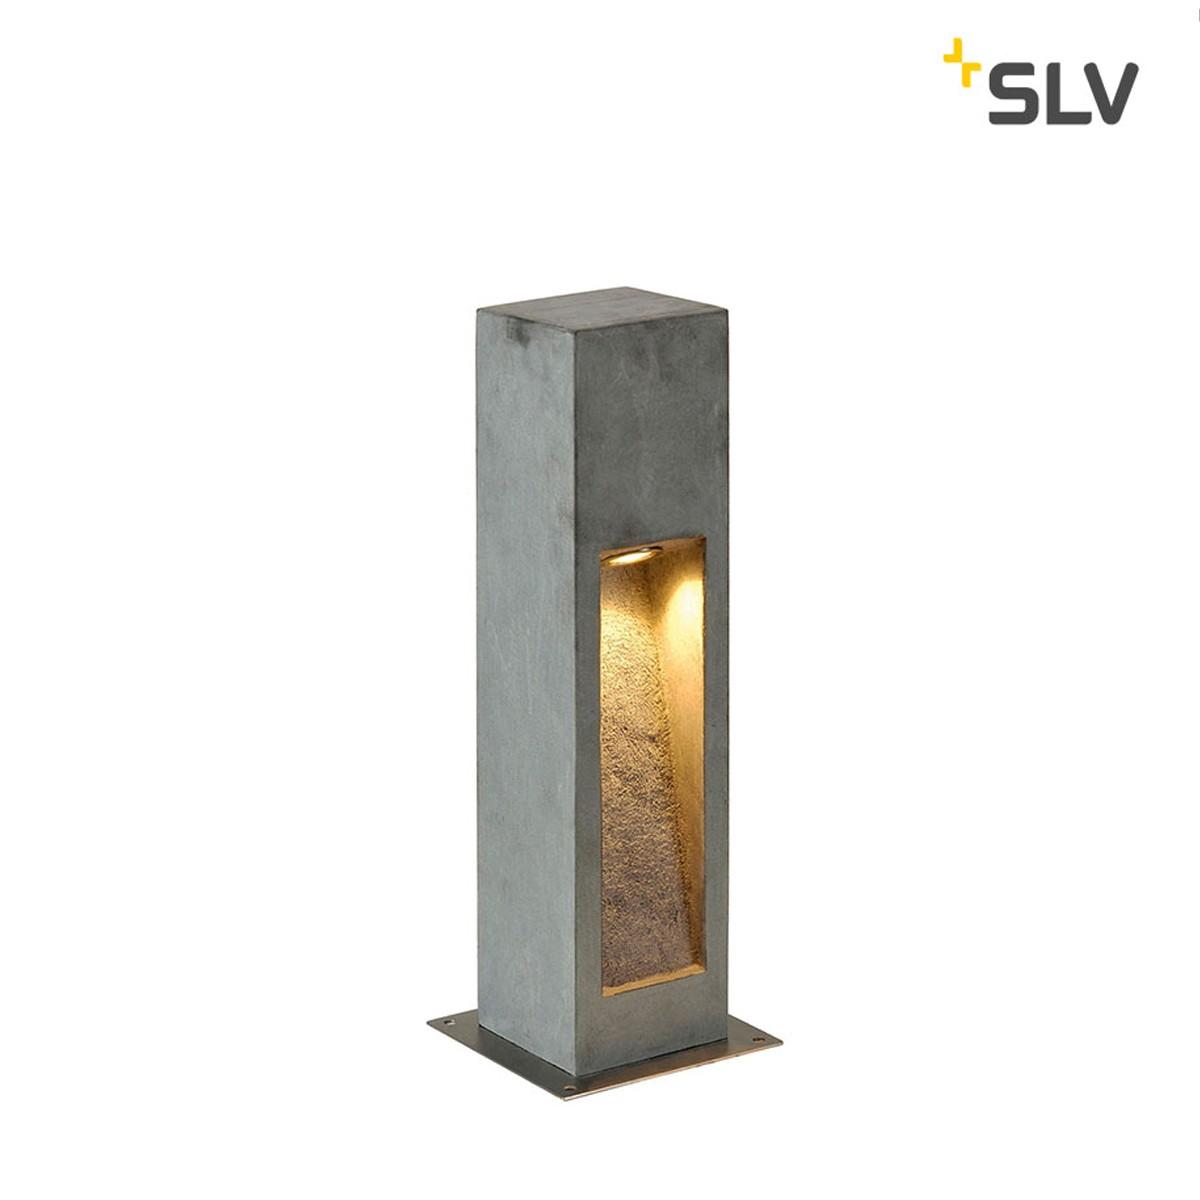 SLV Arrock Stone LED Außenstehleuchte, Höhe: 50 cm, steingrau